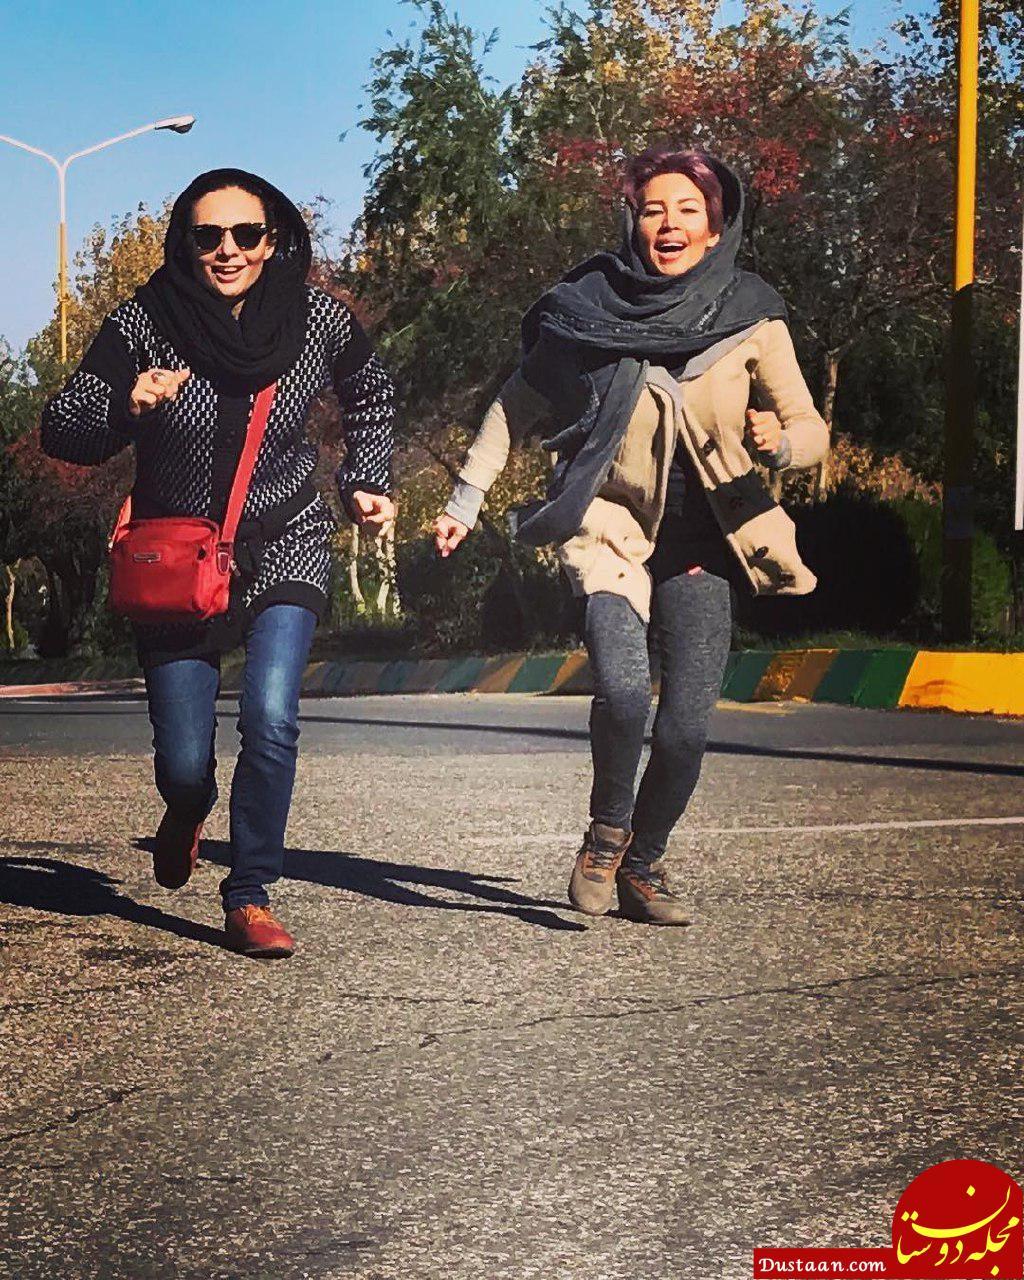 چهره ها/ عکس شاد و پر انرژی «یکتا ناصر» و خواهرش «نیکتا»